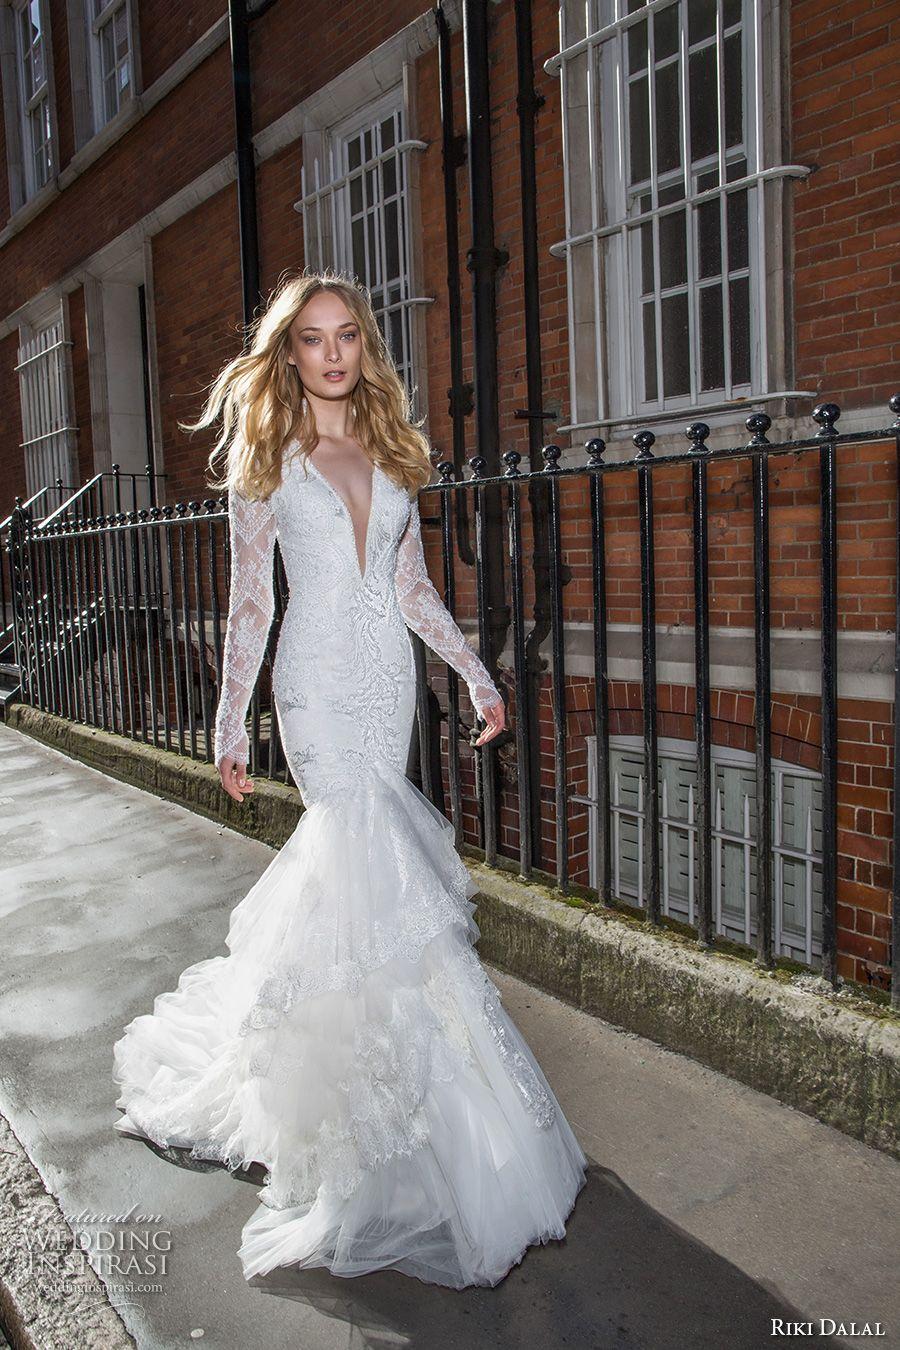 Riki dalal fall wedding dresses u ucmayfairud bridal collection